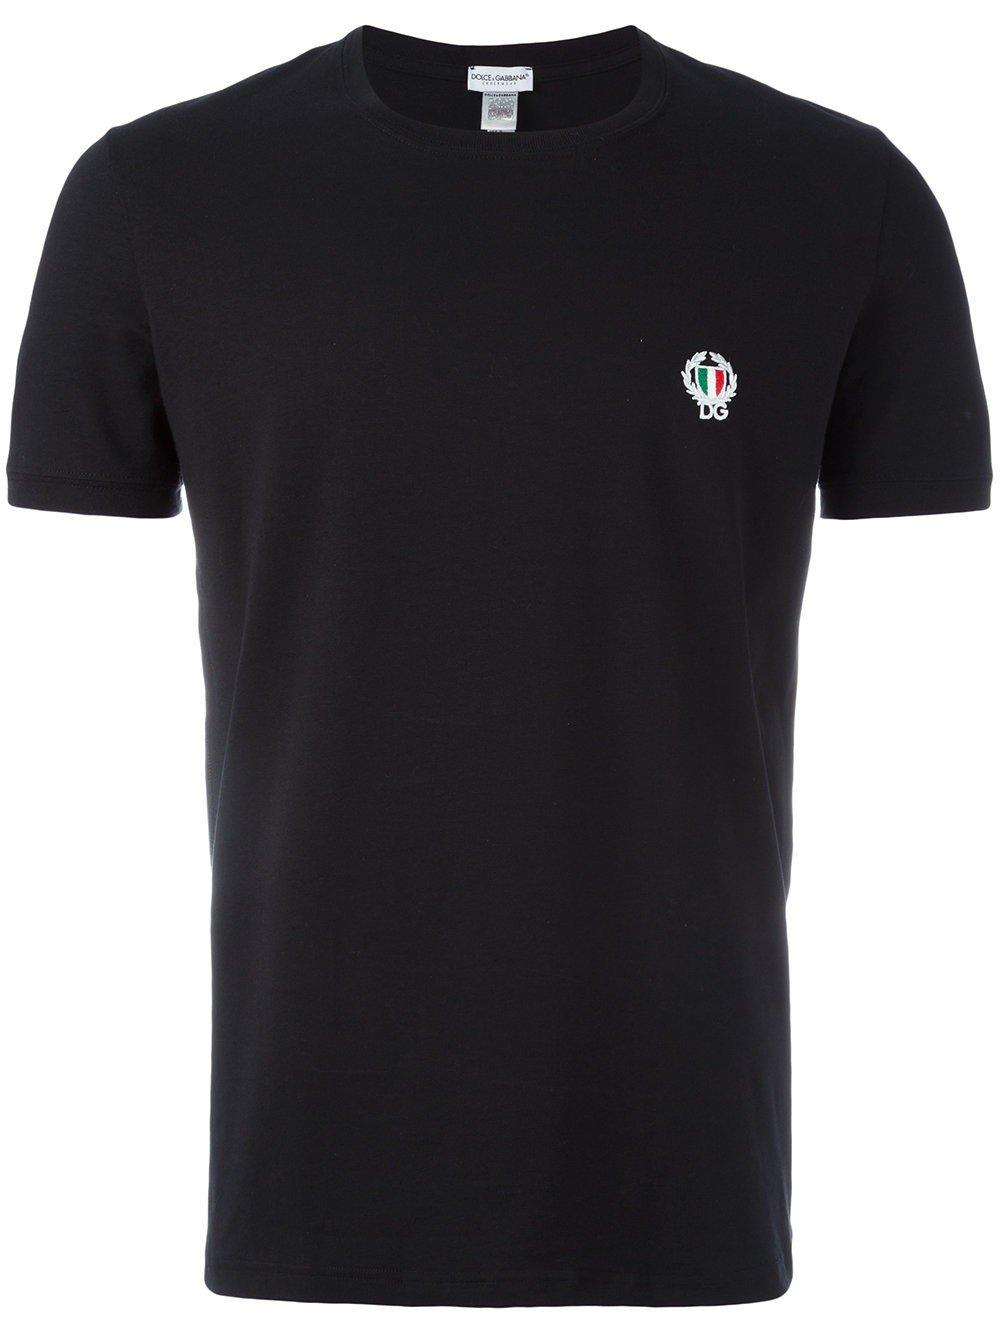 Shirt DOLCE & GABBANA r-neck N8A03J